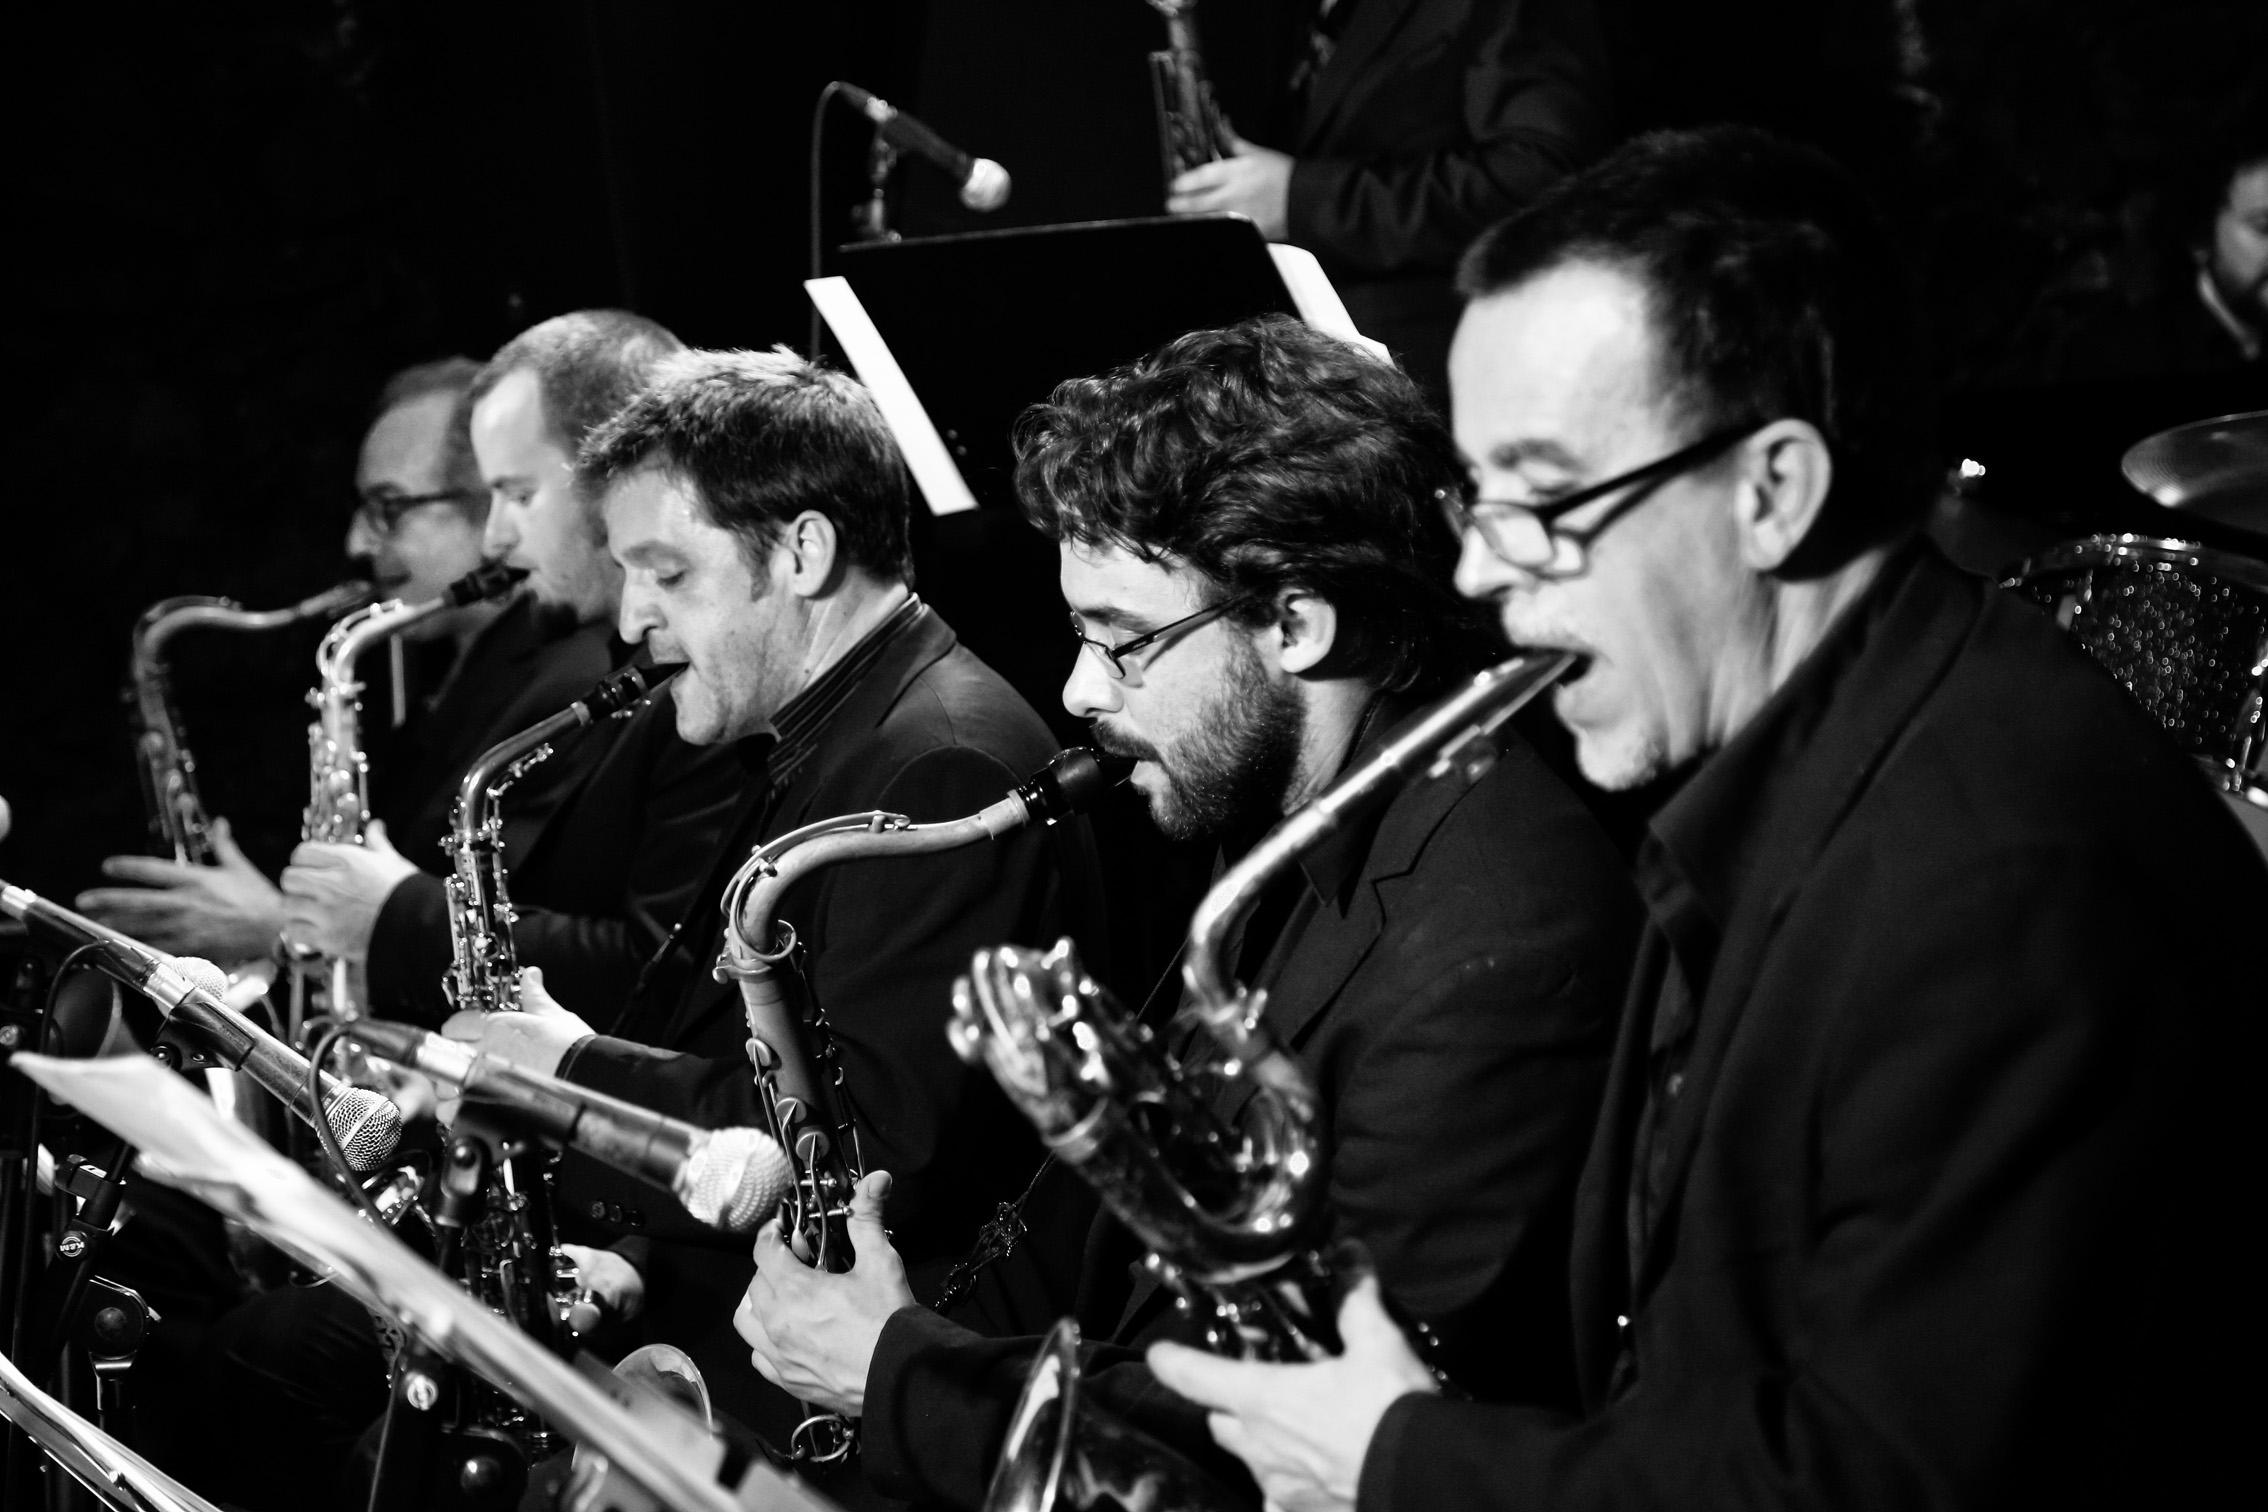 The Barcelona Jazz Orquestra